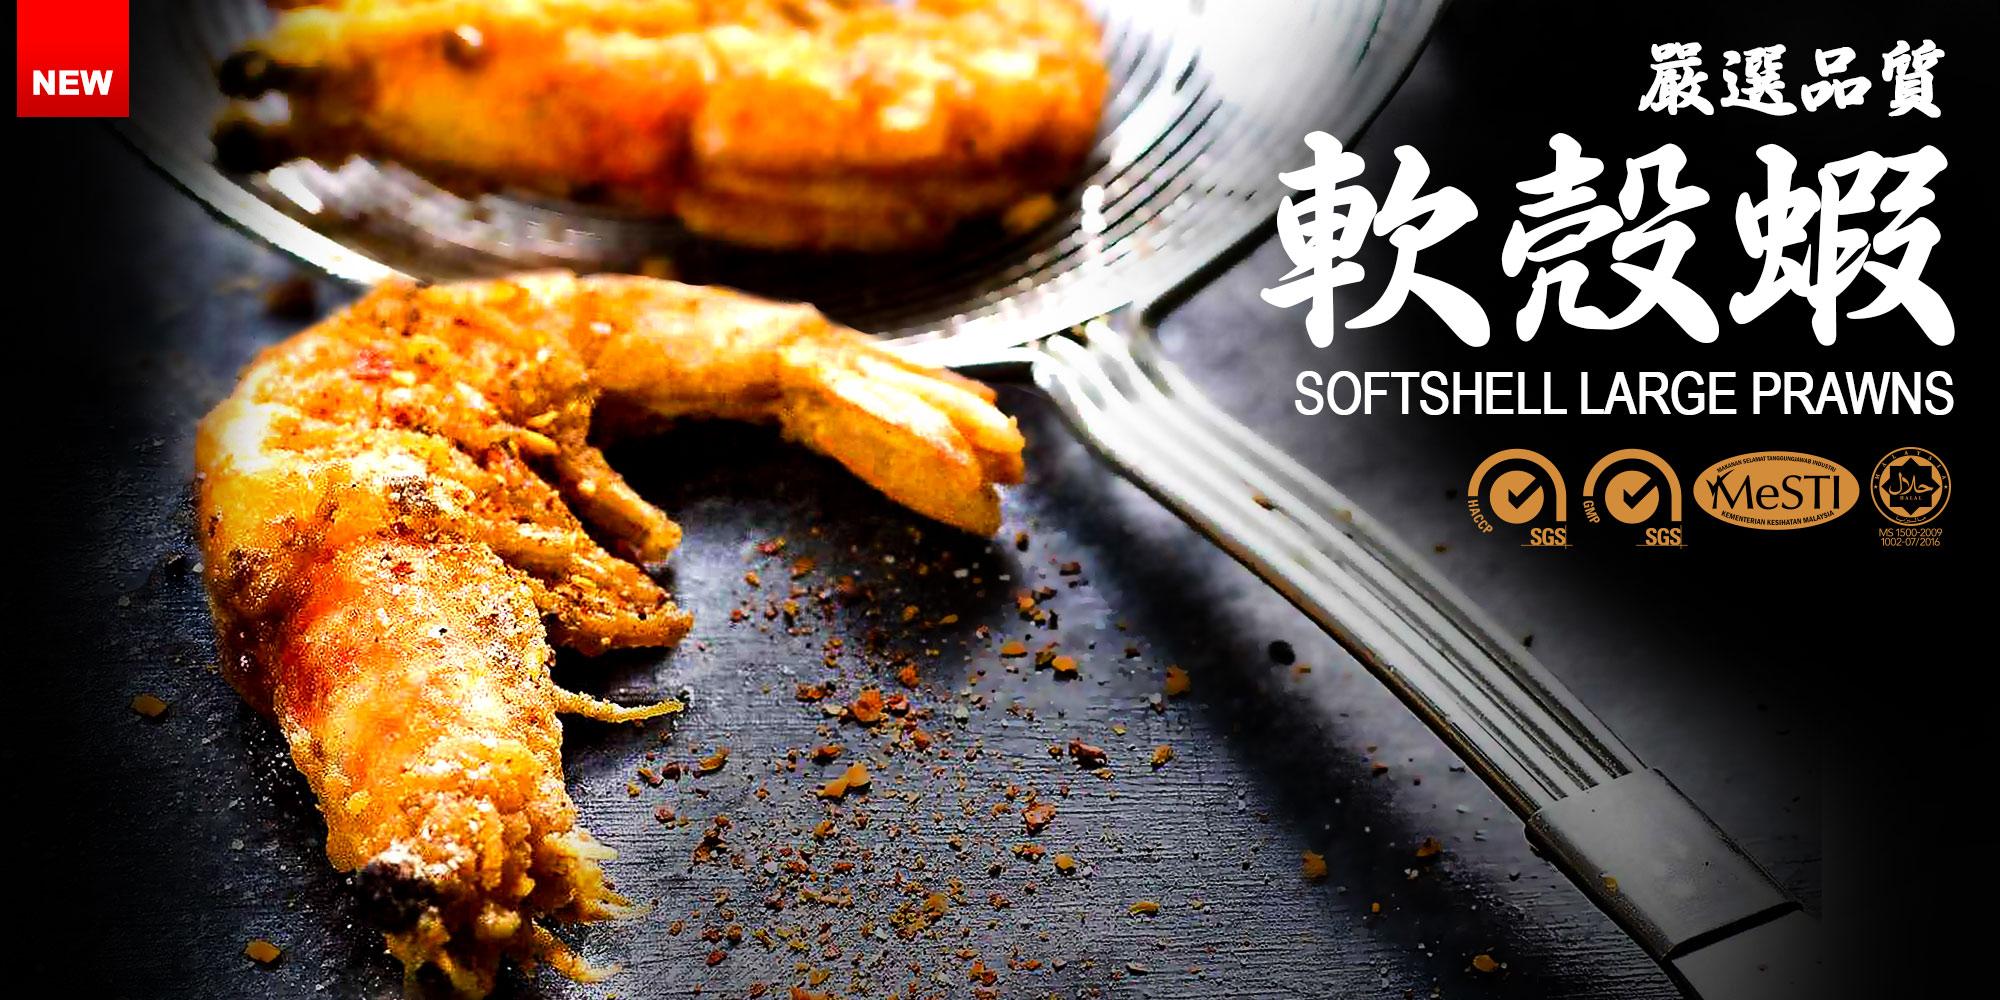 Sabah Softshell Prawn Product